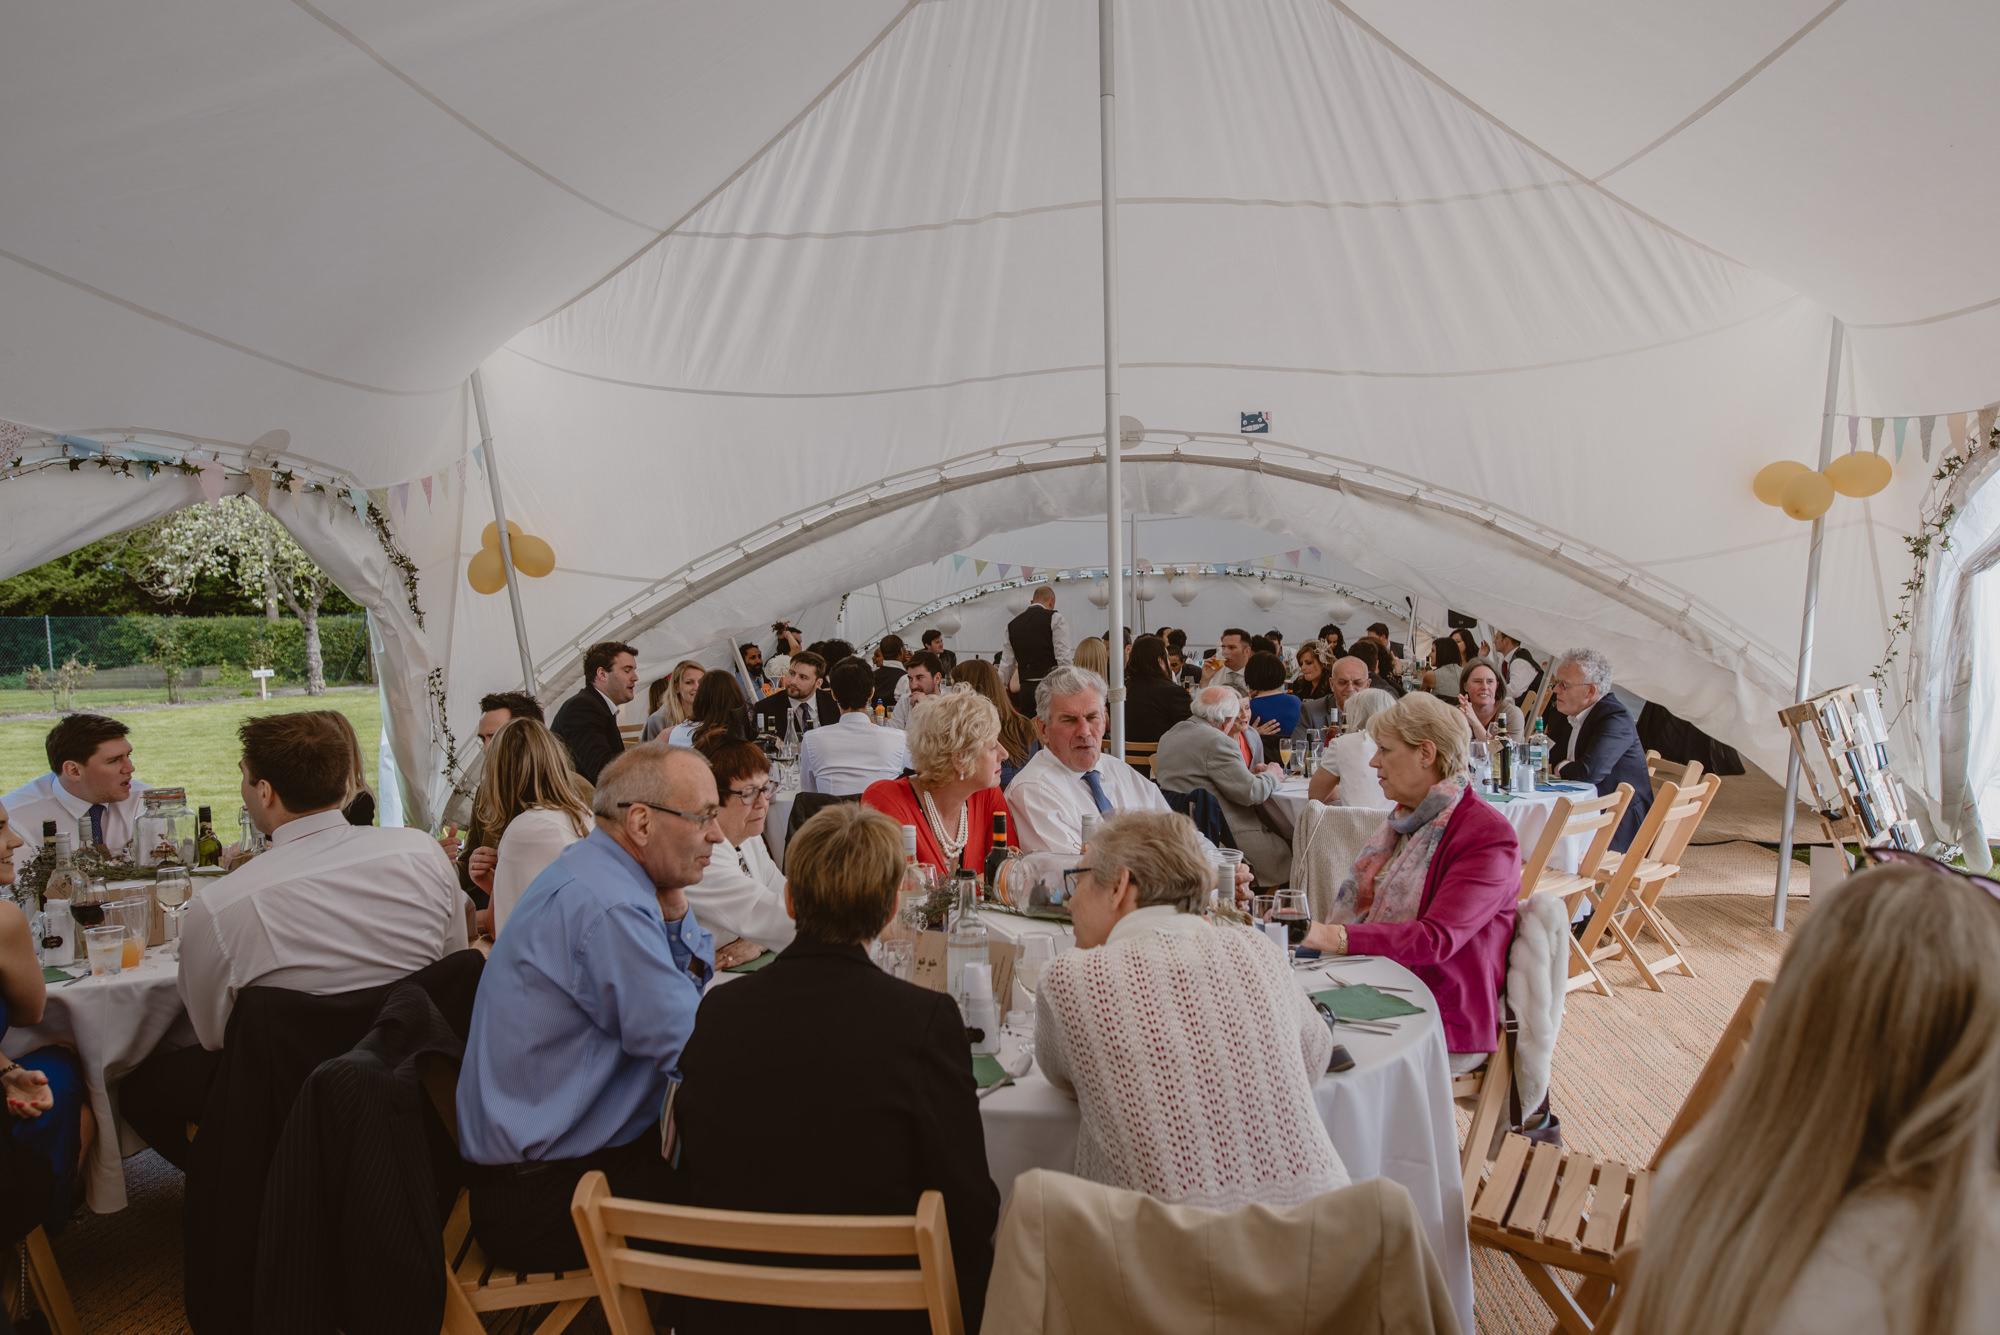 Jacqueline-Gareth-Wedding-Westmead-Events-Surrey-Manu-Mendoza-Wedding-Photography-375.jpg